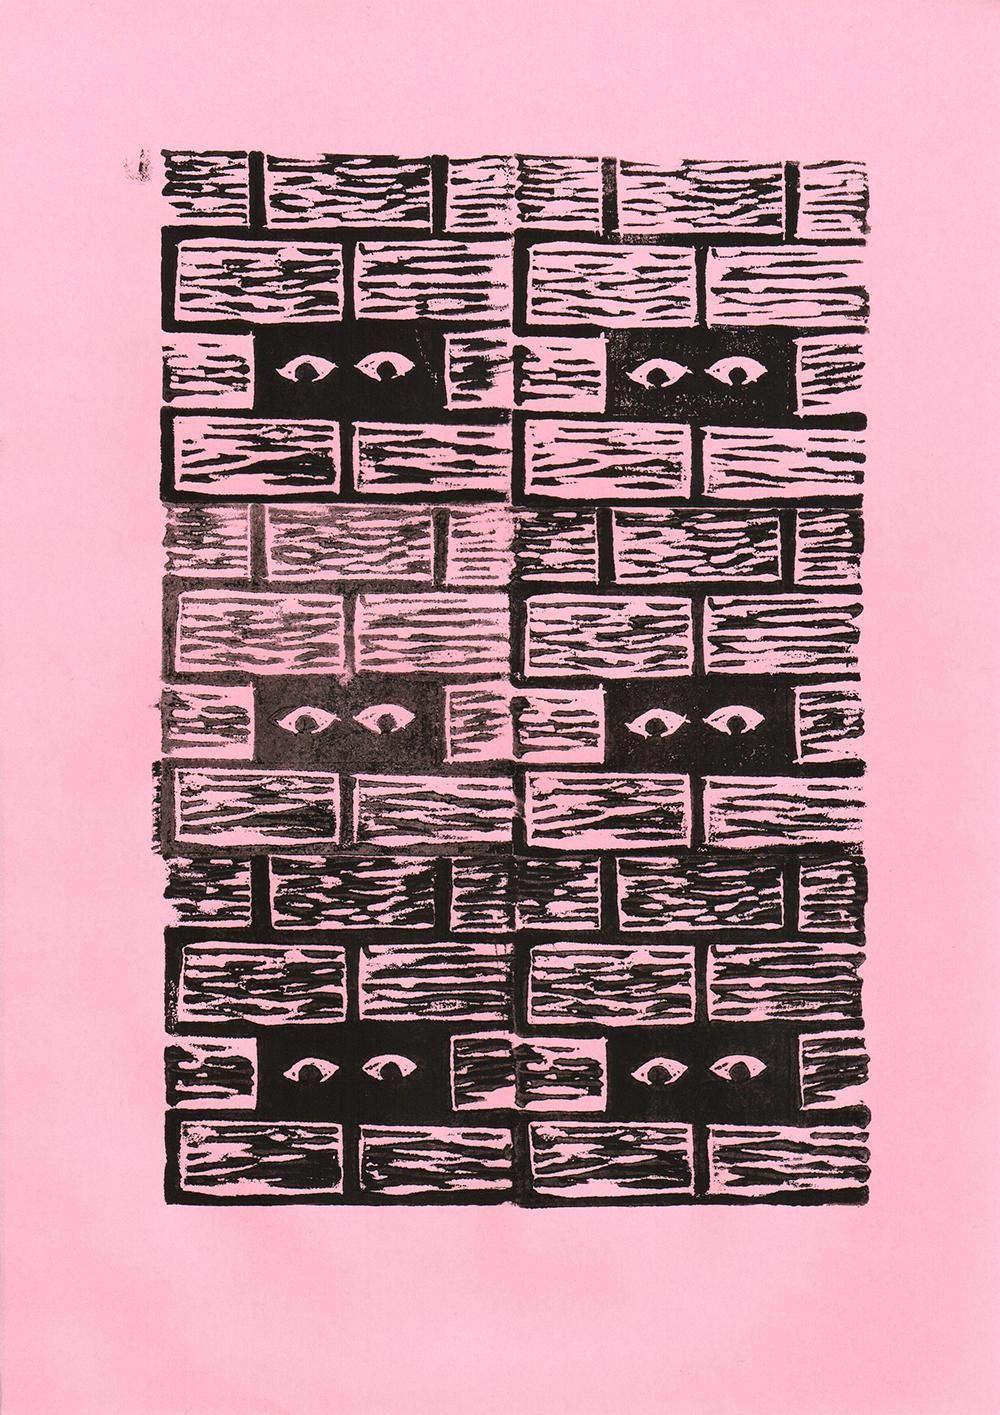 Geometric Linocut Patterns - image 11 - student project